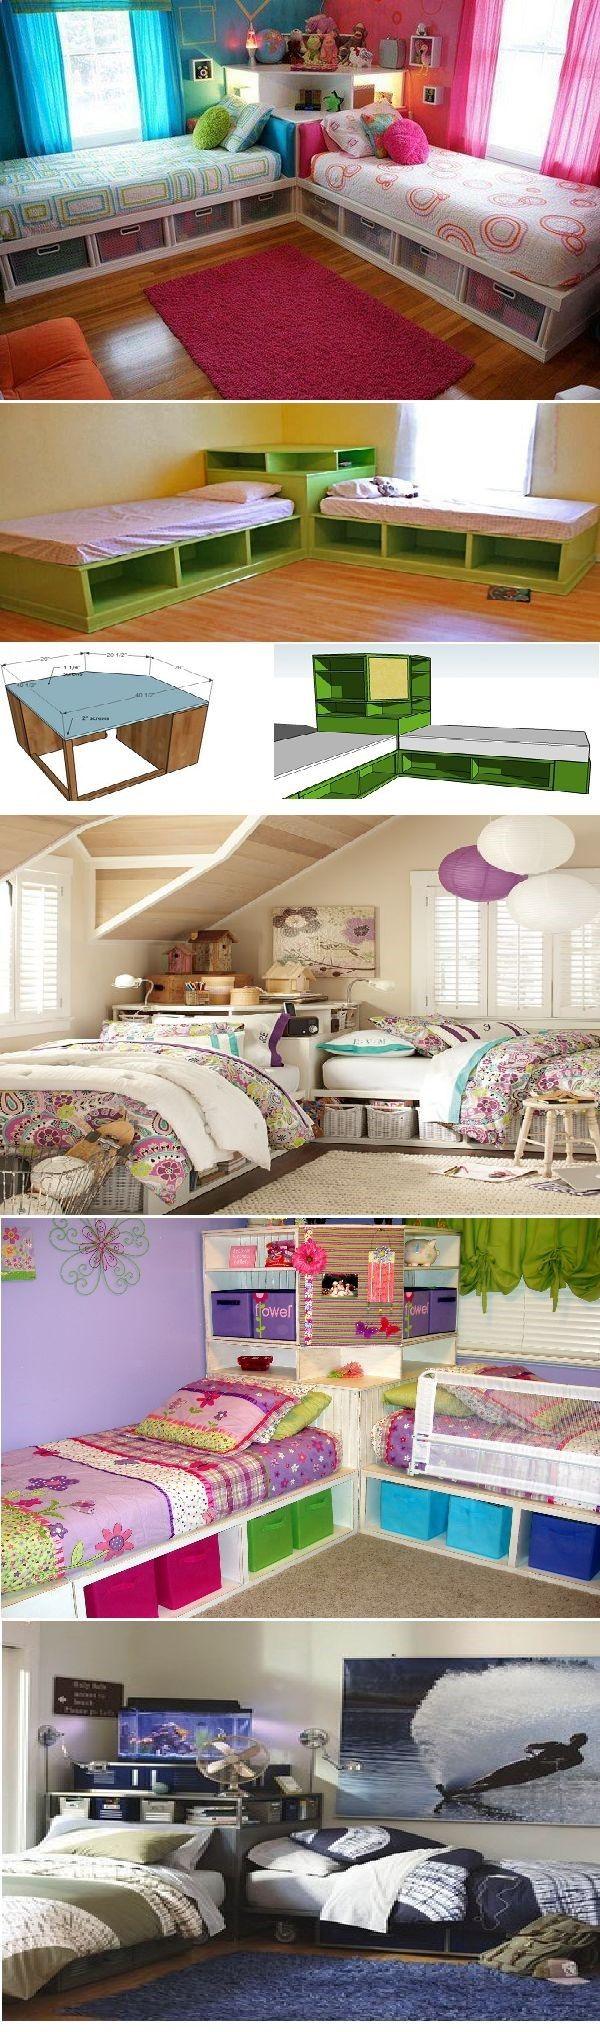 DIY Twin Corner Beds With Storage. CALLEE!   decorwithzest.com